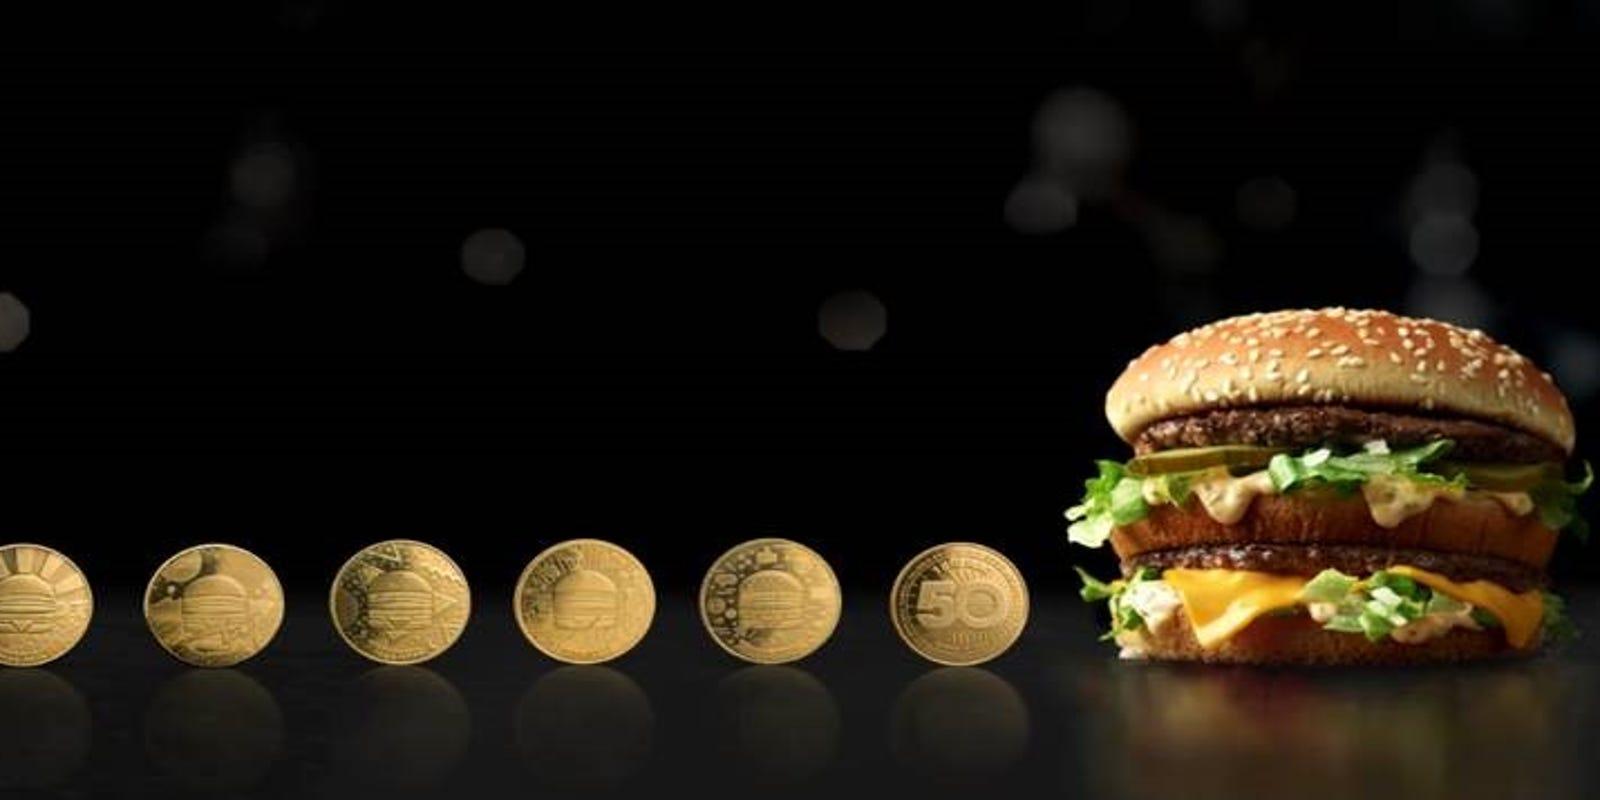 big mac 40 år McDonald's unveils MacCoin to celebrate Big Mac's 50th anniversary big mac 40 år